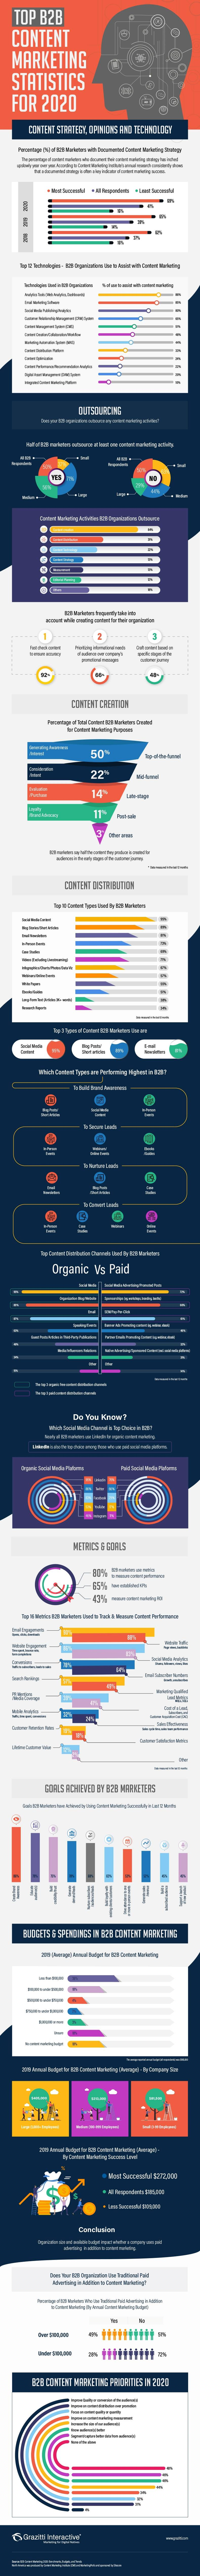 200303-Top-B2B-Content-Marketing-Statistics-2020-cmi-marketingprofs-infographic